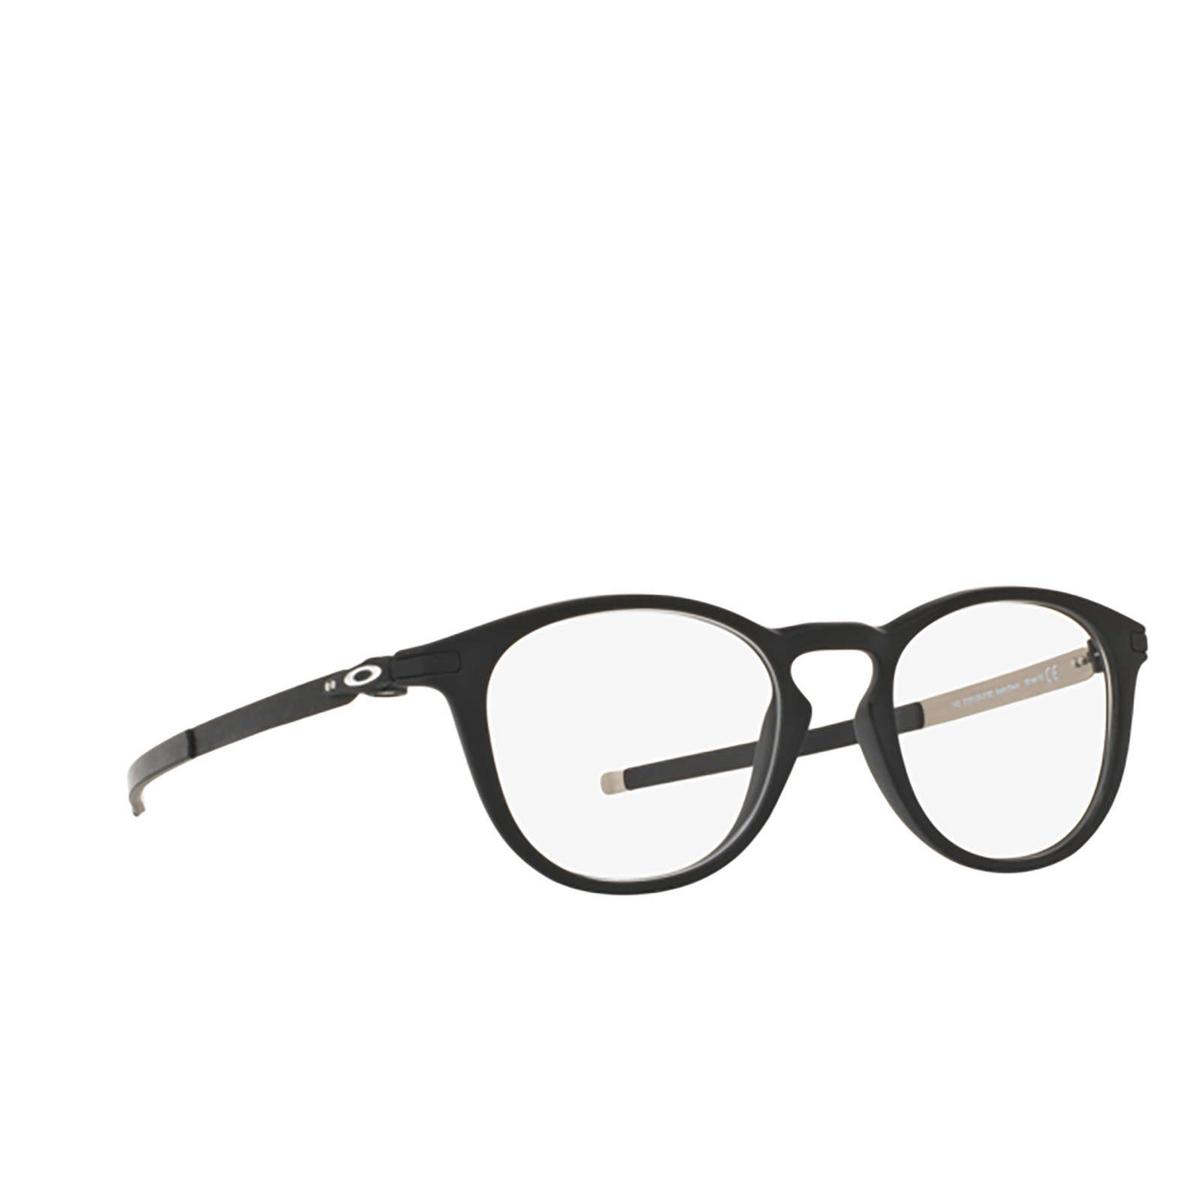 Oakley® Round Eyeglasses: Pitchman R OX8105 color Satin Black 810501 - three-quarters view.